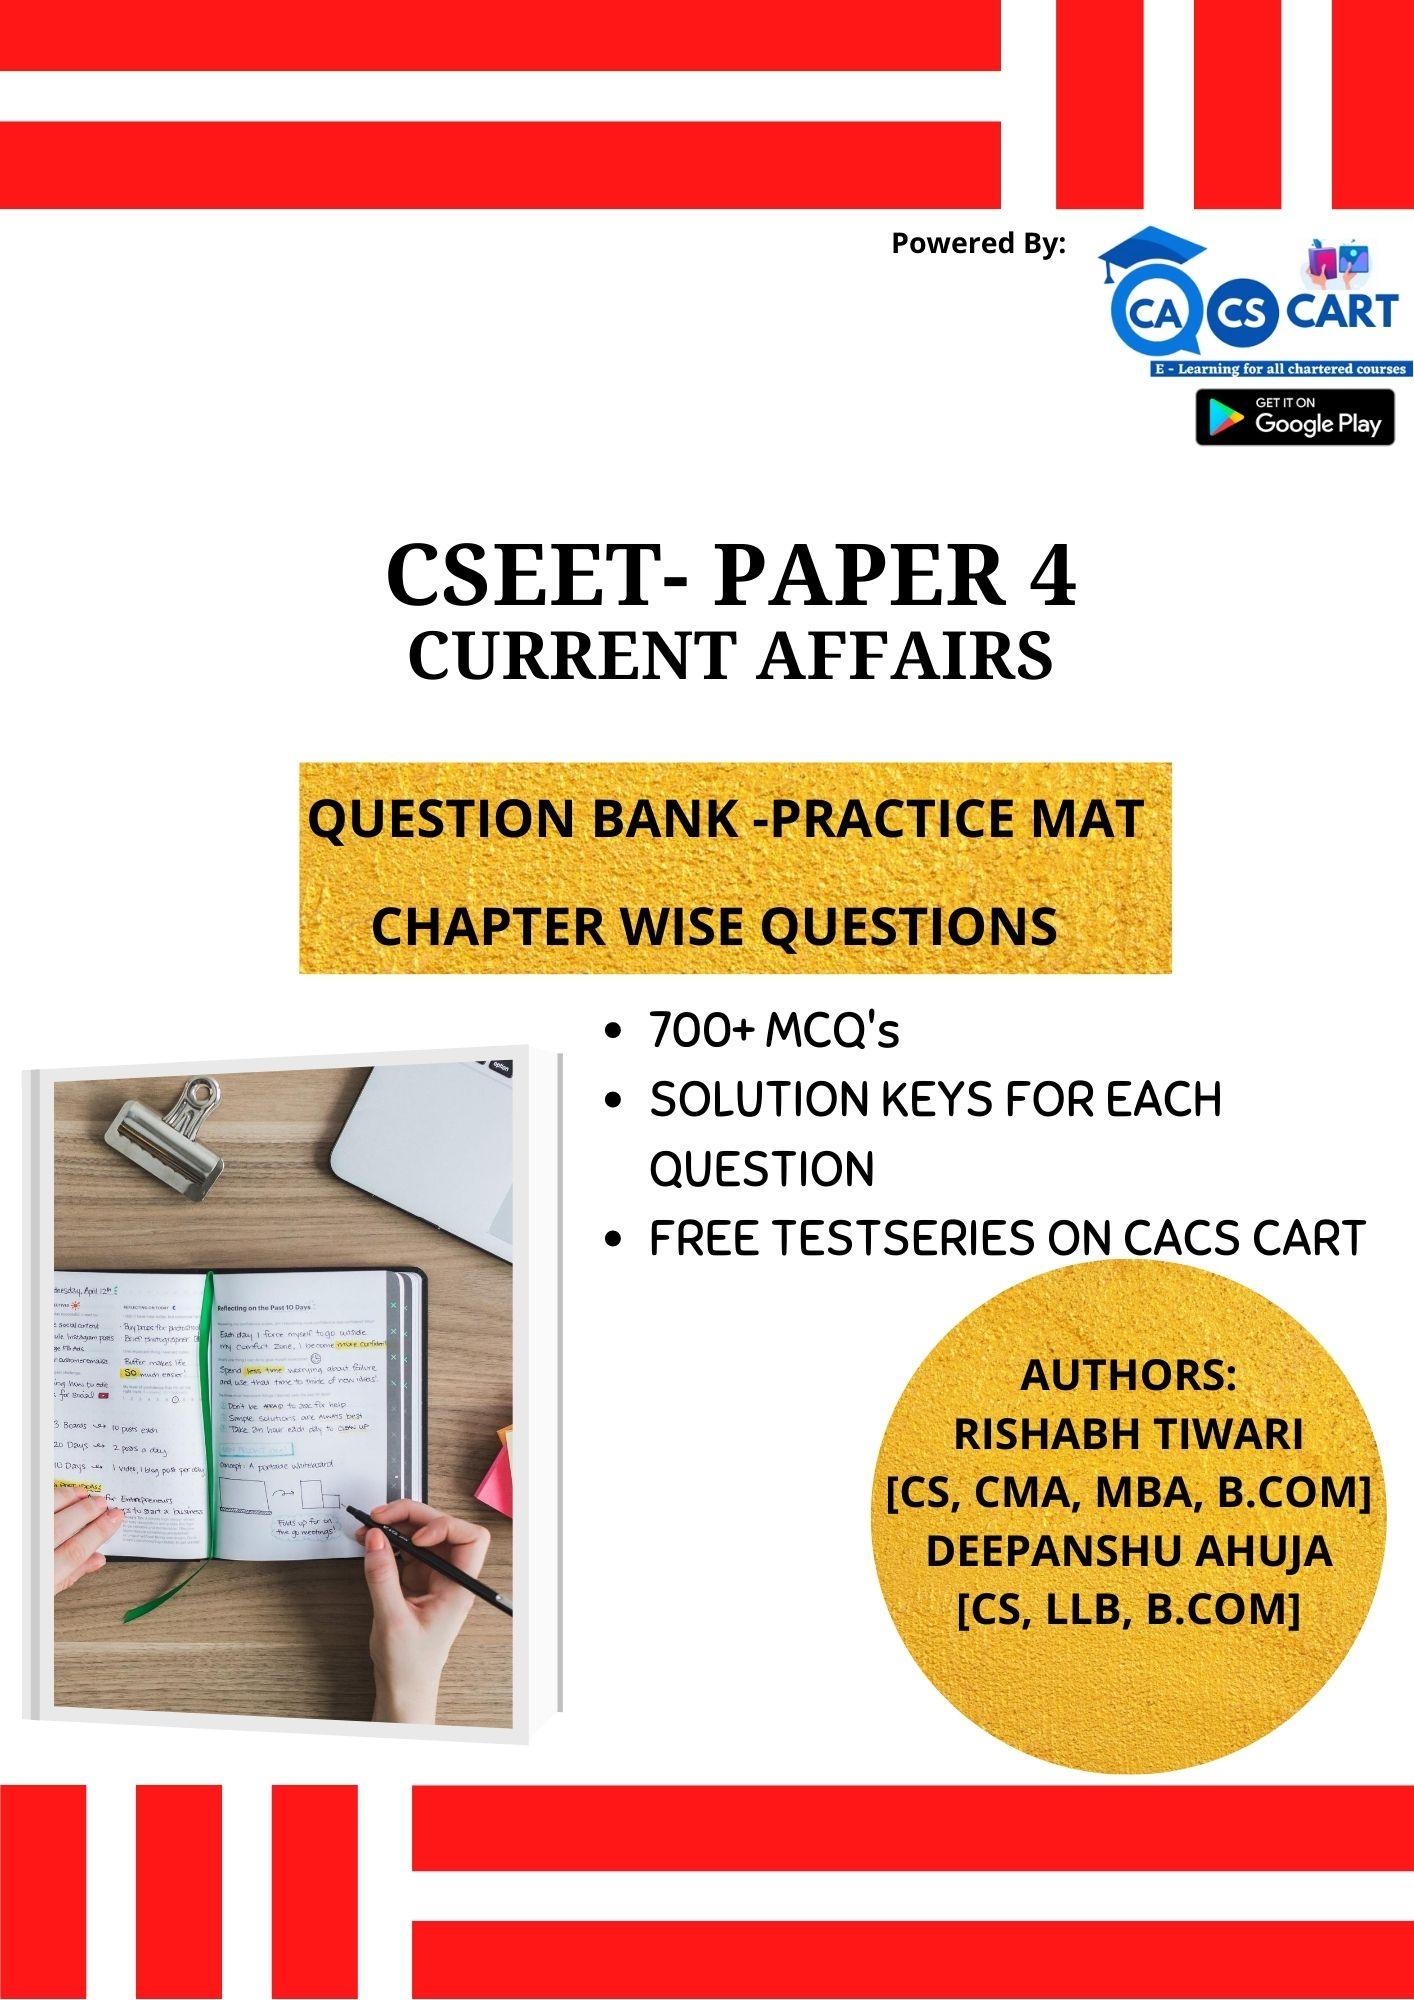 CSEET PAPER 4 Current Affairs Presentation & Skills Practice Mat